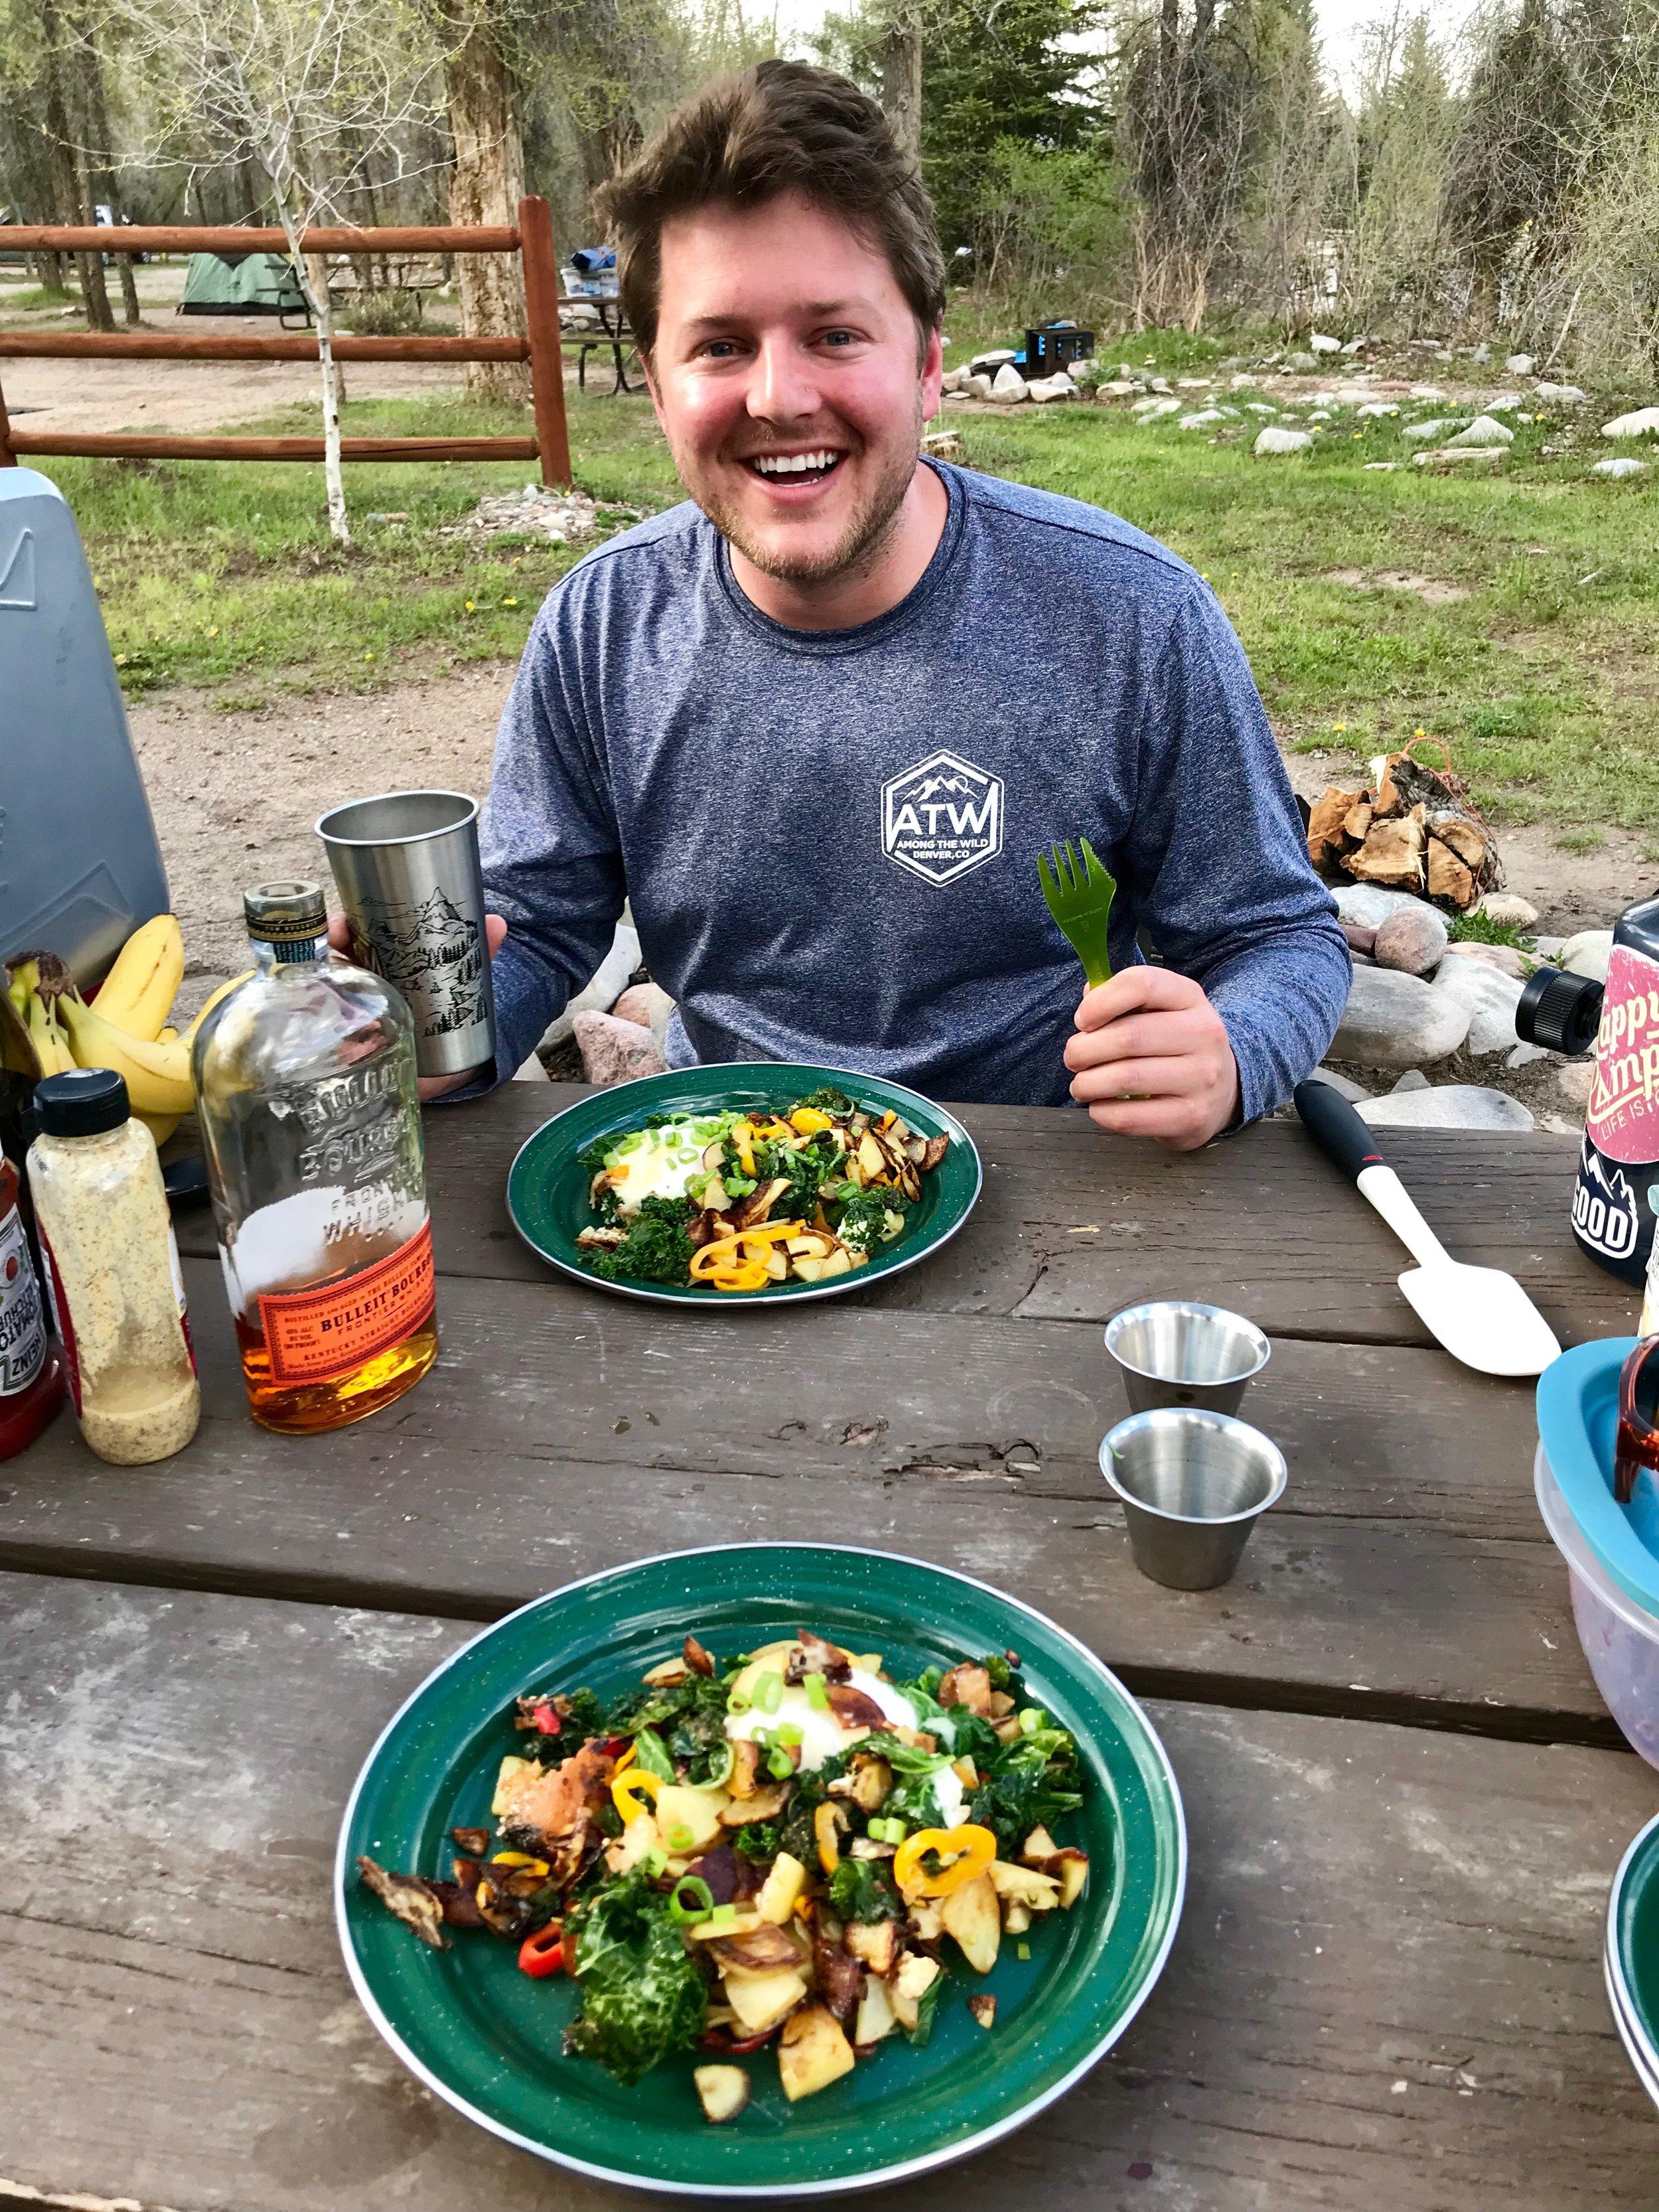 Happy camper, dinner is served!